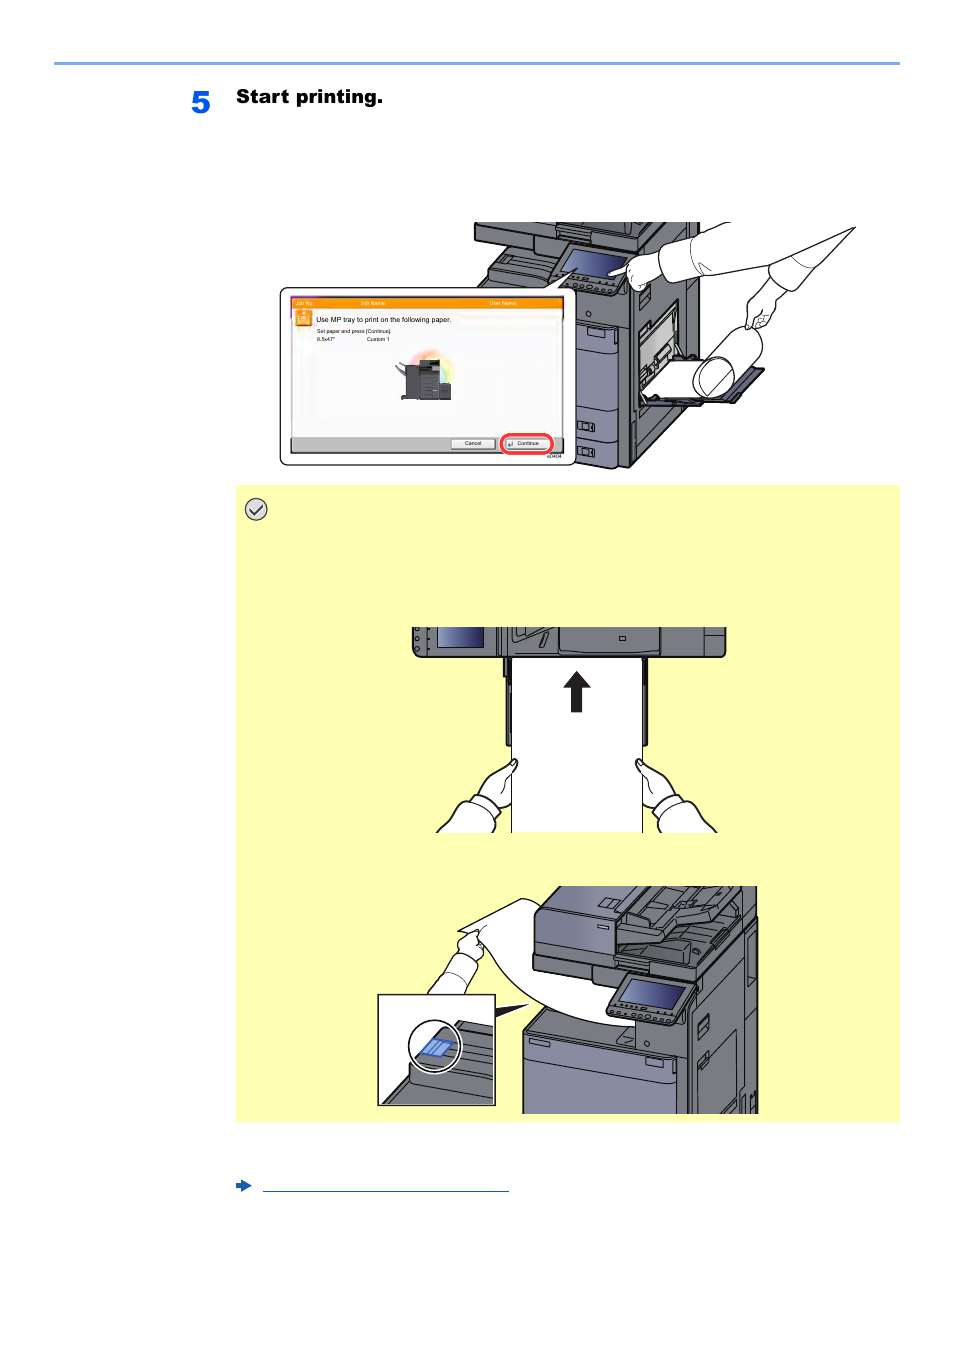 Start printing | Kyocera TASKalfa 2552ci User Manual | Page 193 / 682